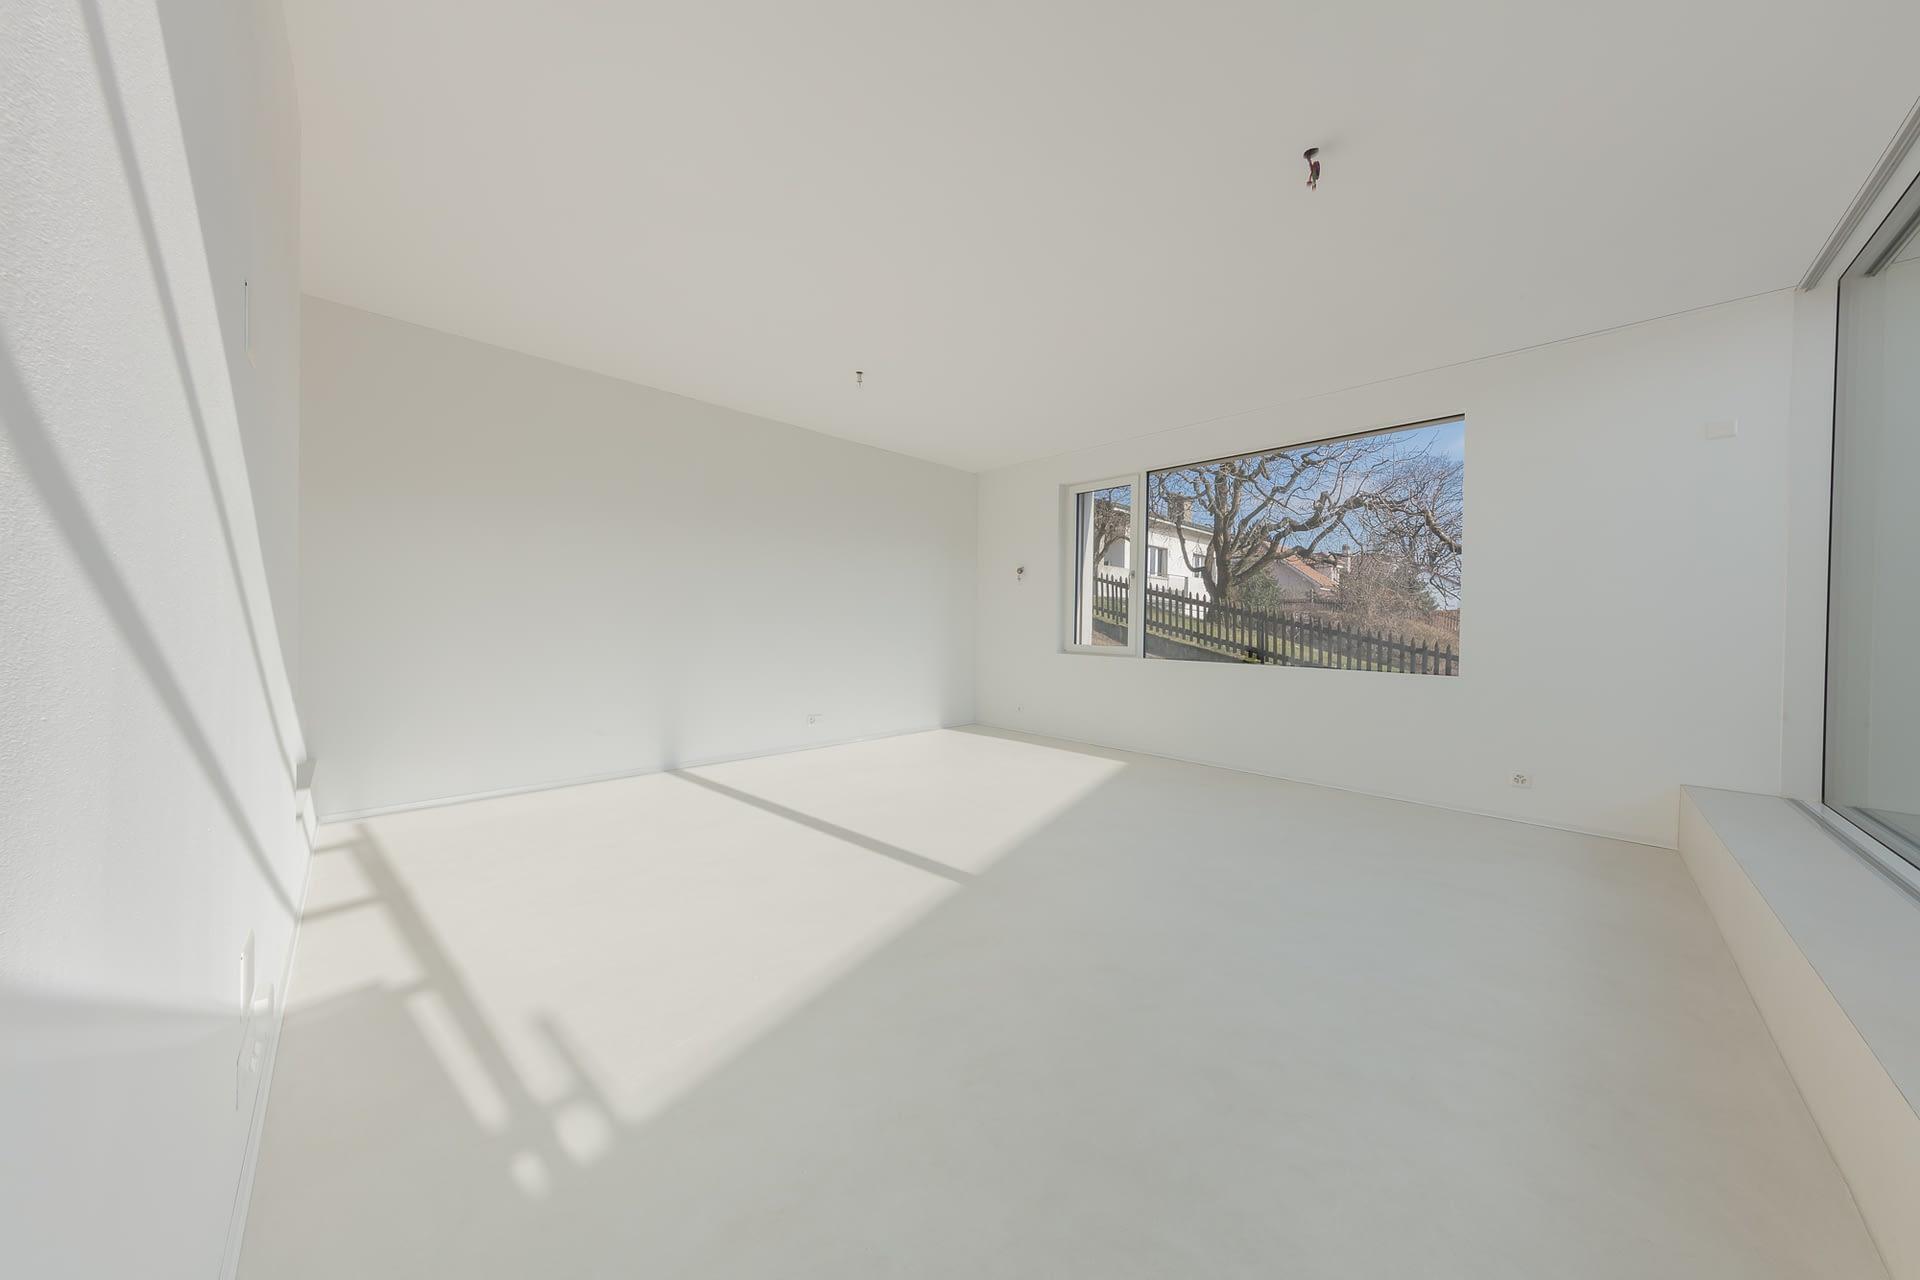 Villa Minoggio Inside by STEMUTZ, 20.02.2018